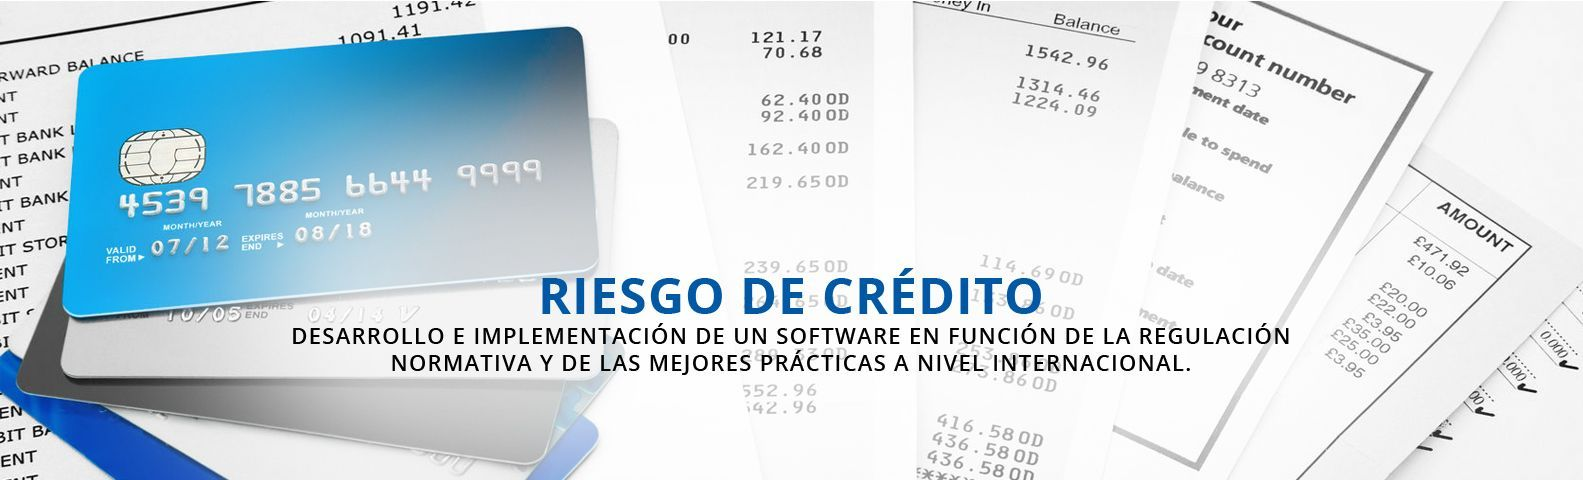 BNR RIESGO DE CREDITO 01